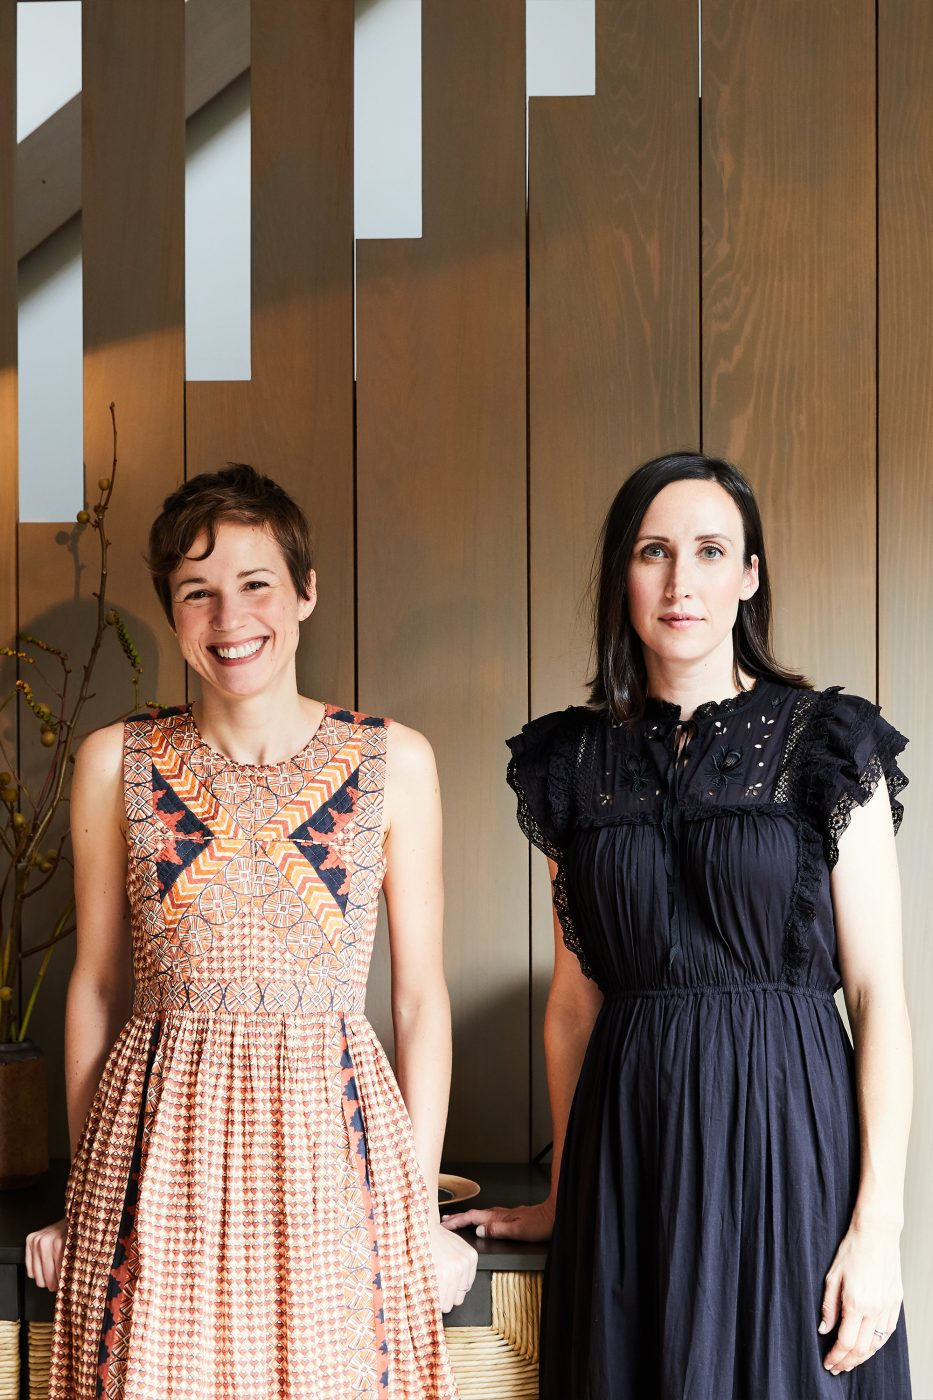 Whitney Parris-Lamb (left) and Amanda Jesse of Brooklyn-based firm JESSE PARRIS-LAMB